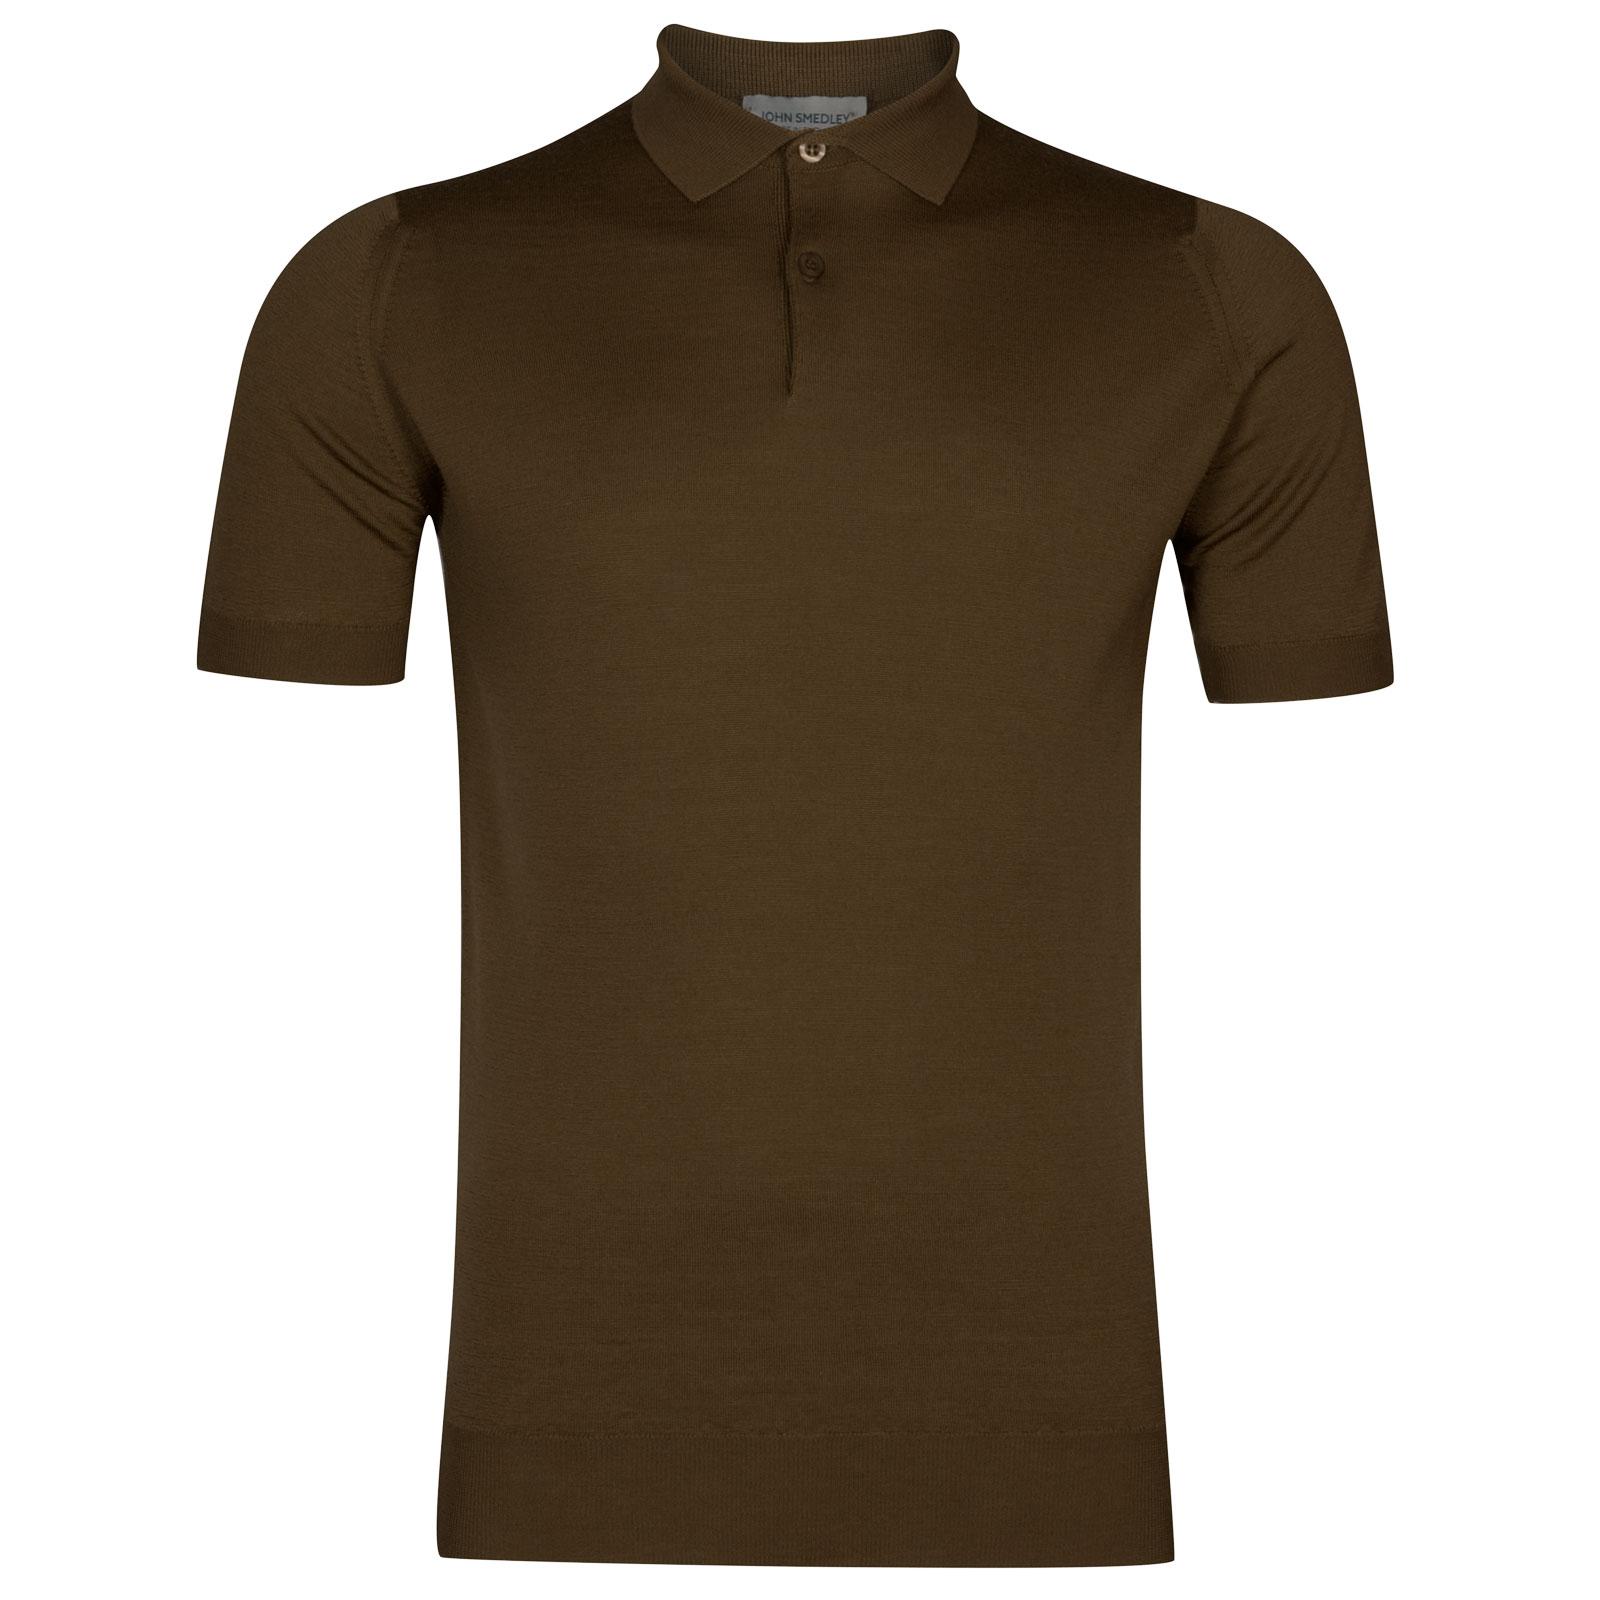 John Smedley payton Merino Wool Shirt in Kielder Green-L